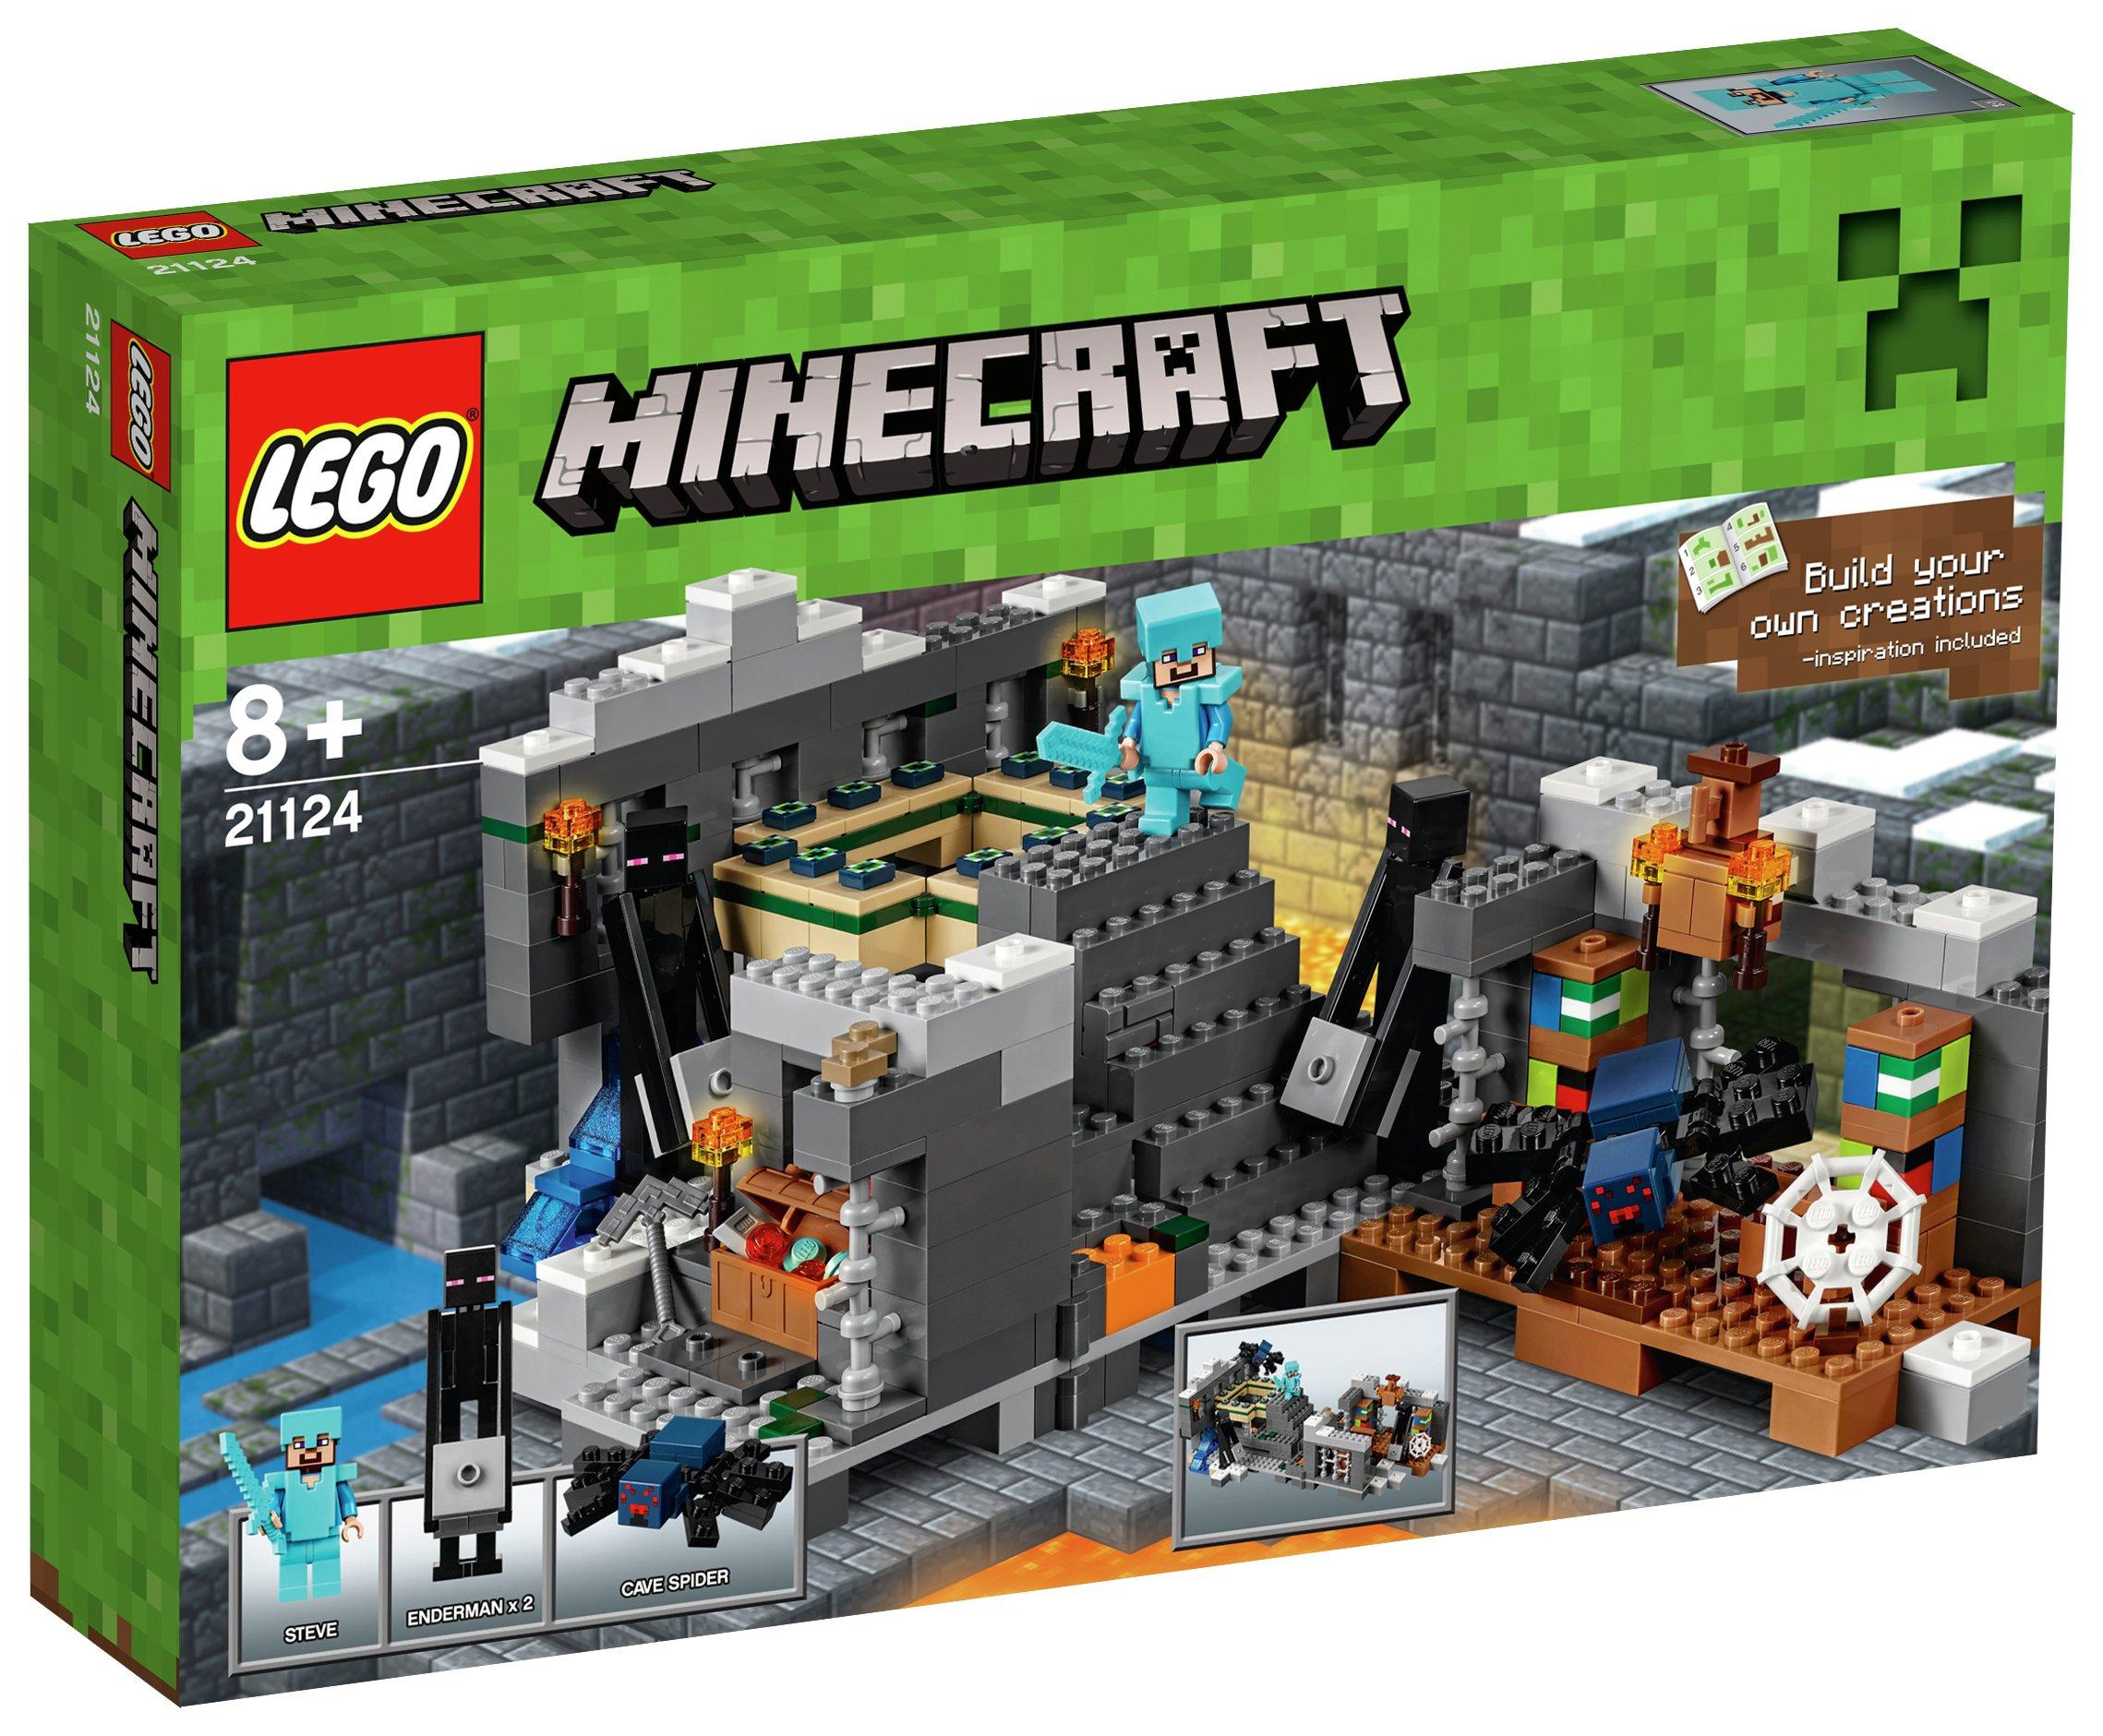 LEGO Minecraft The End Portal Playset - 21124.